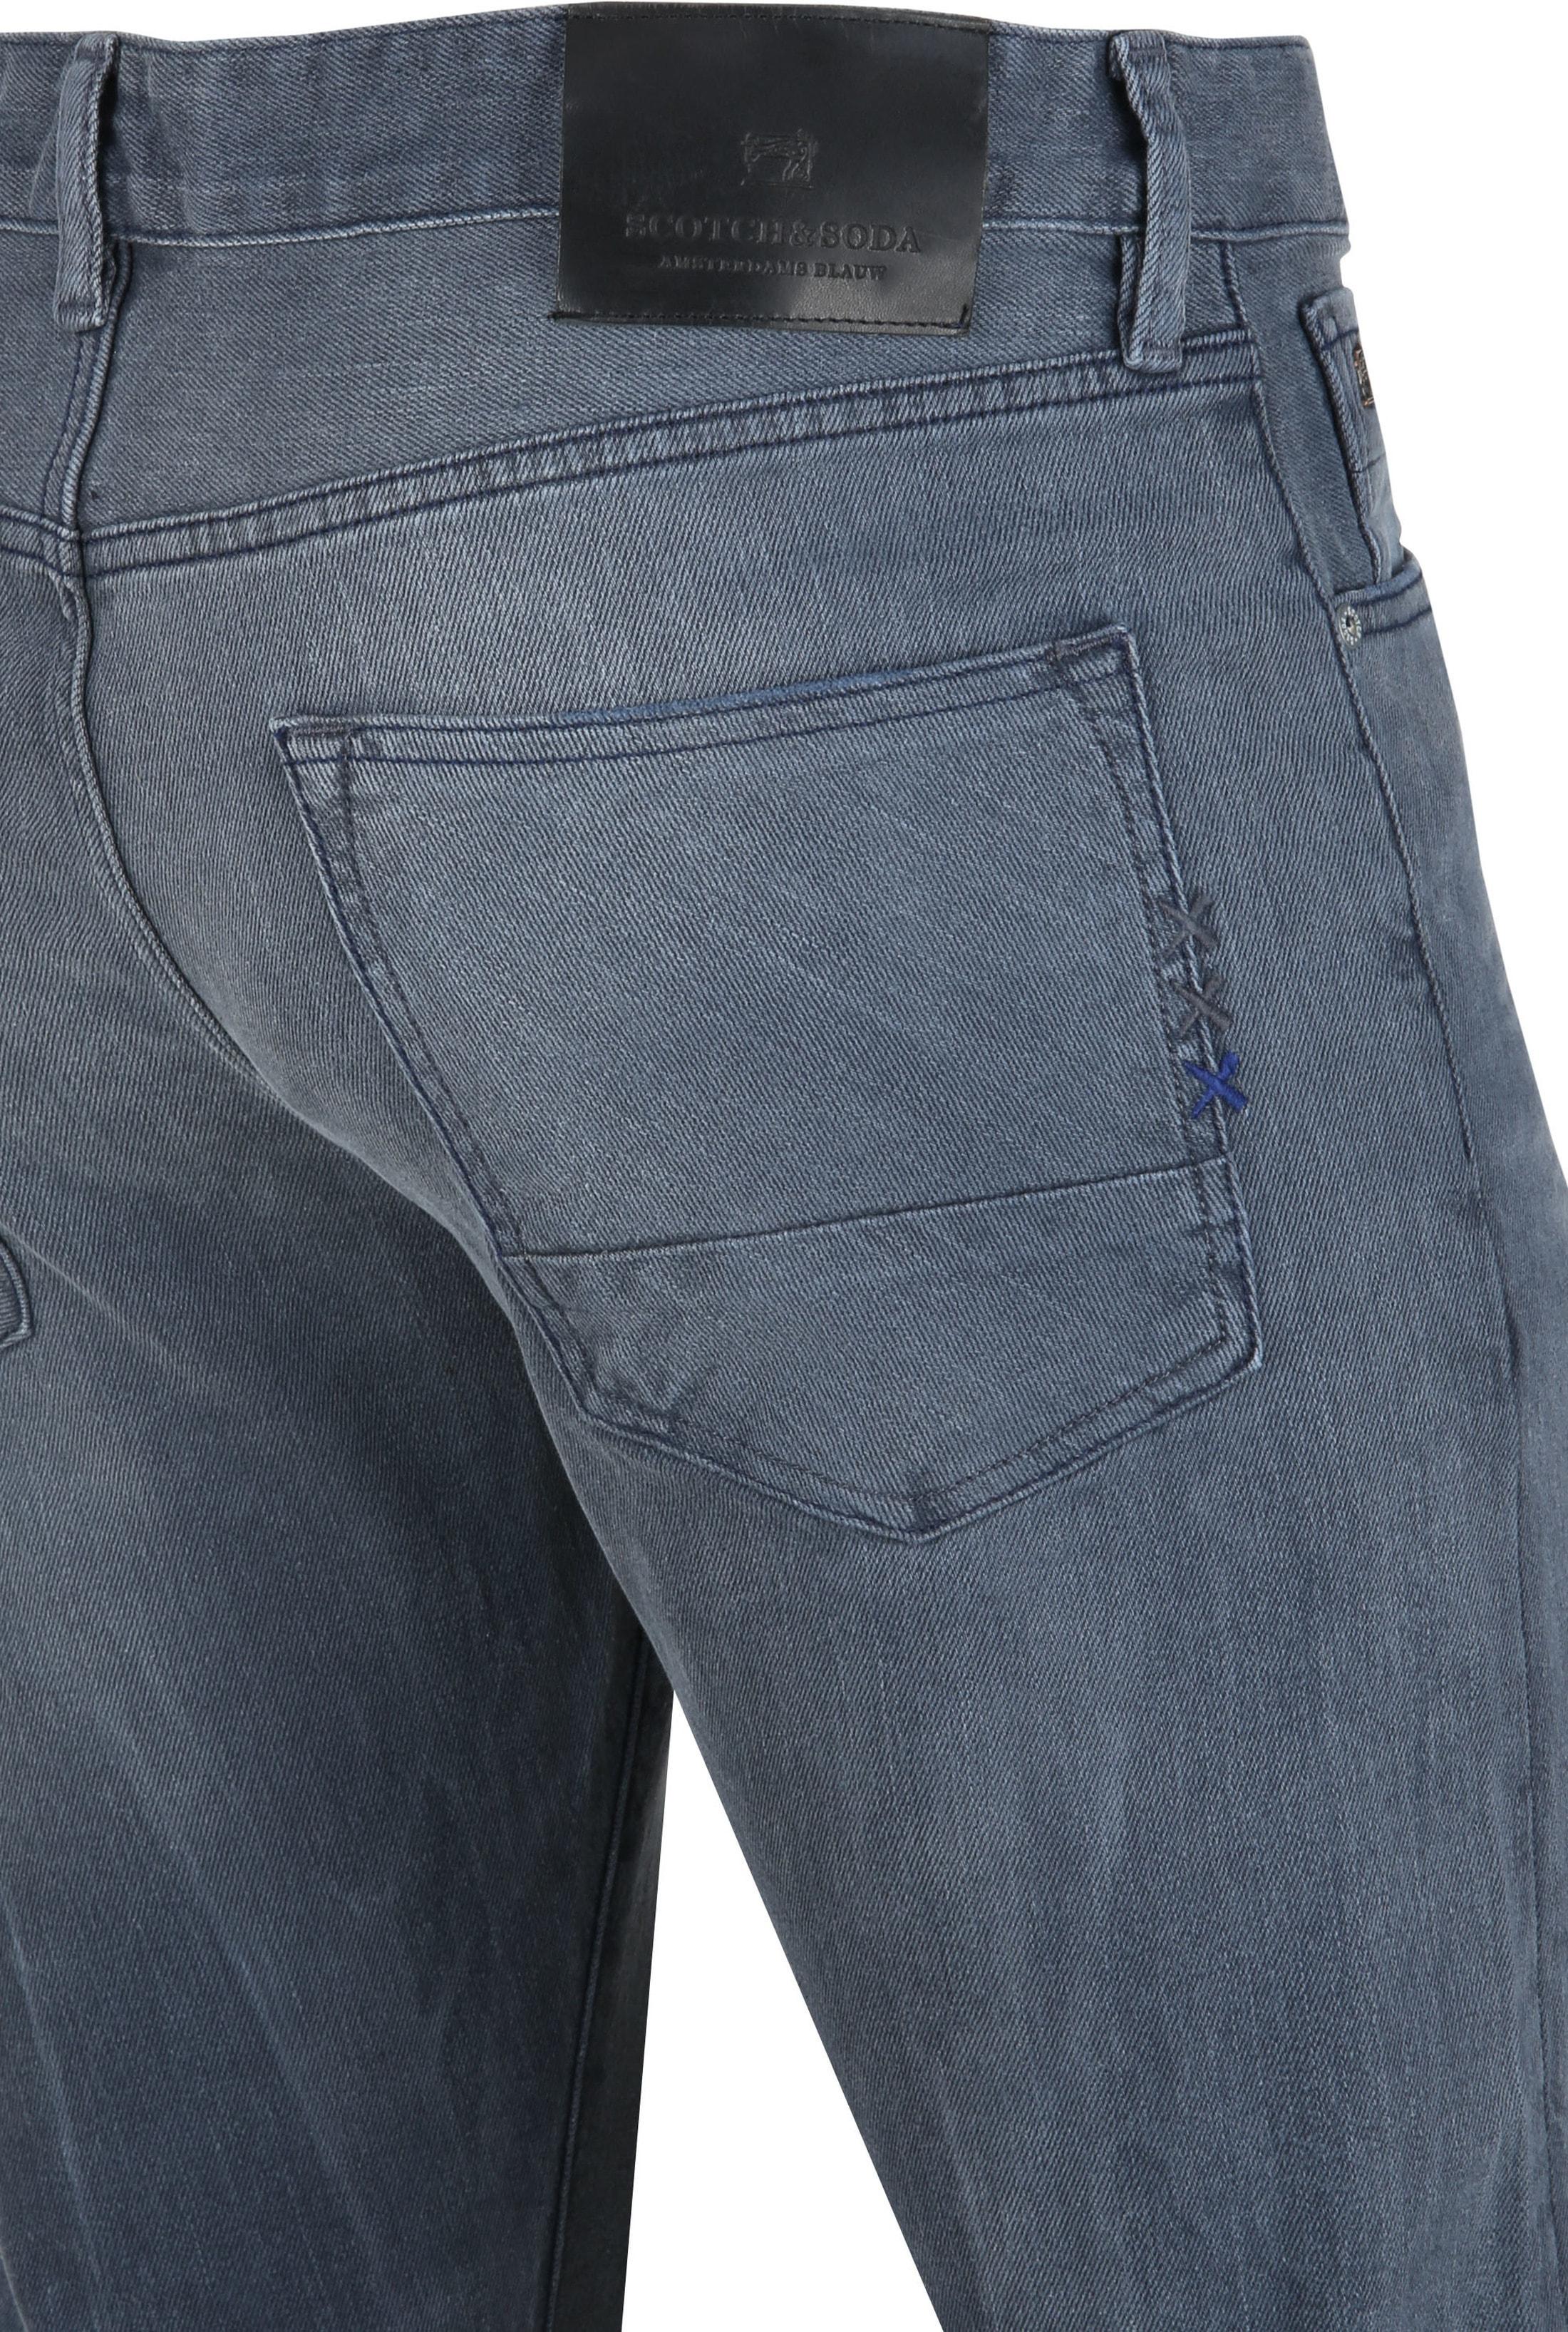 Scotch & Soda Ralston Jeans Concrete Bleach foto 2